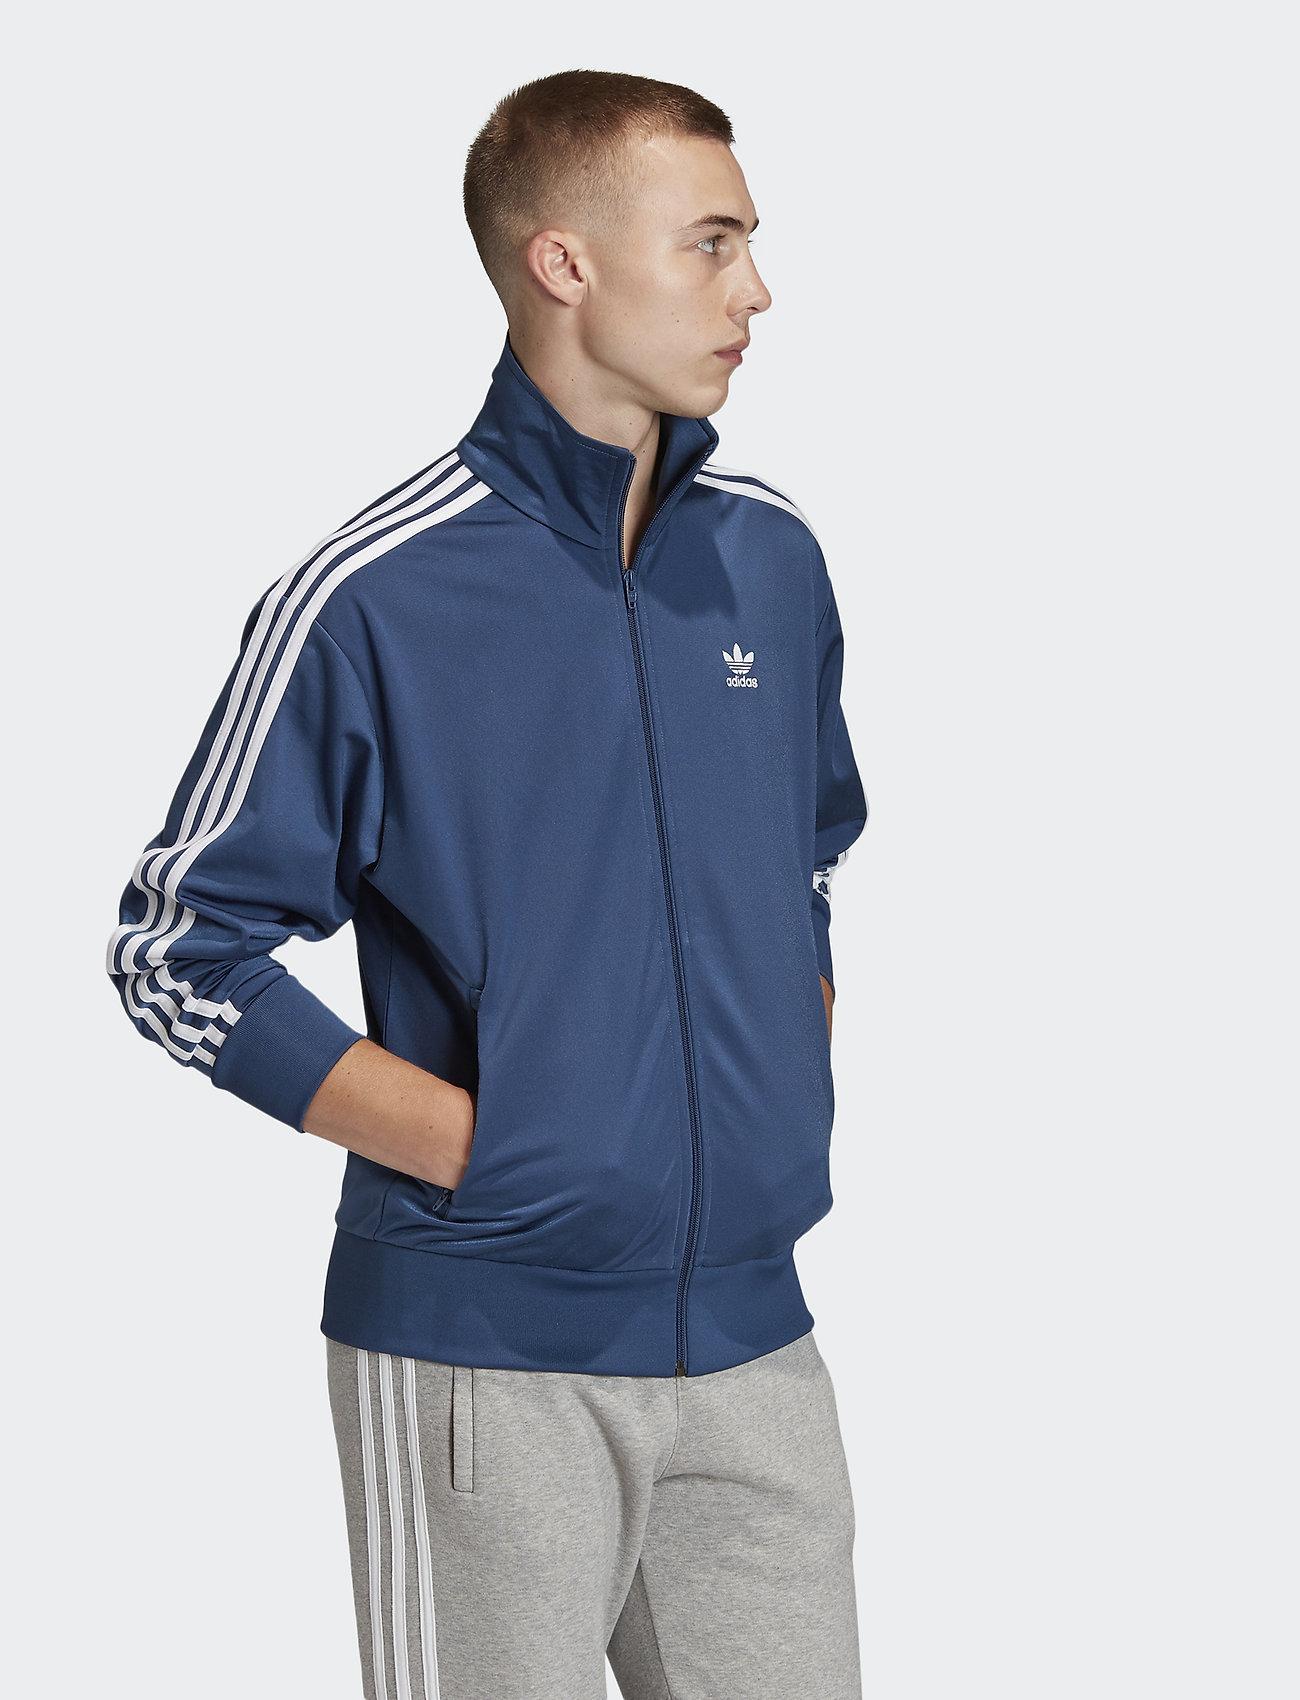 adidas Originals - FIREBIRD TT - basic-sweatshirts - nmarin - 0